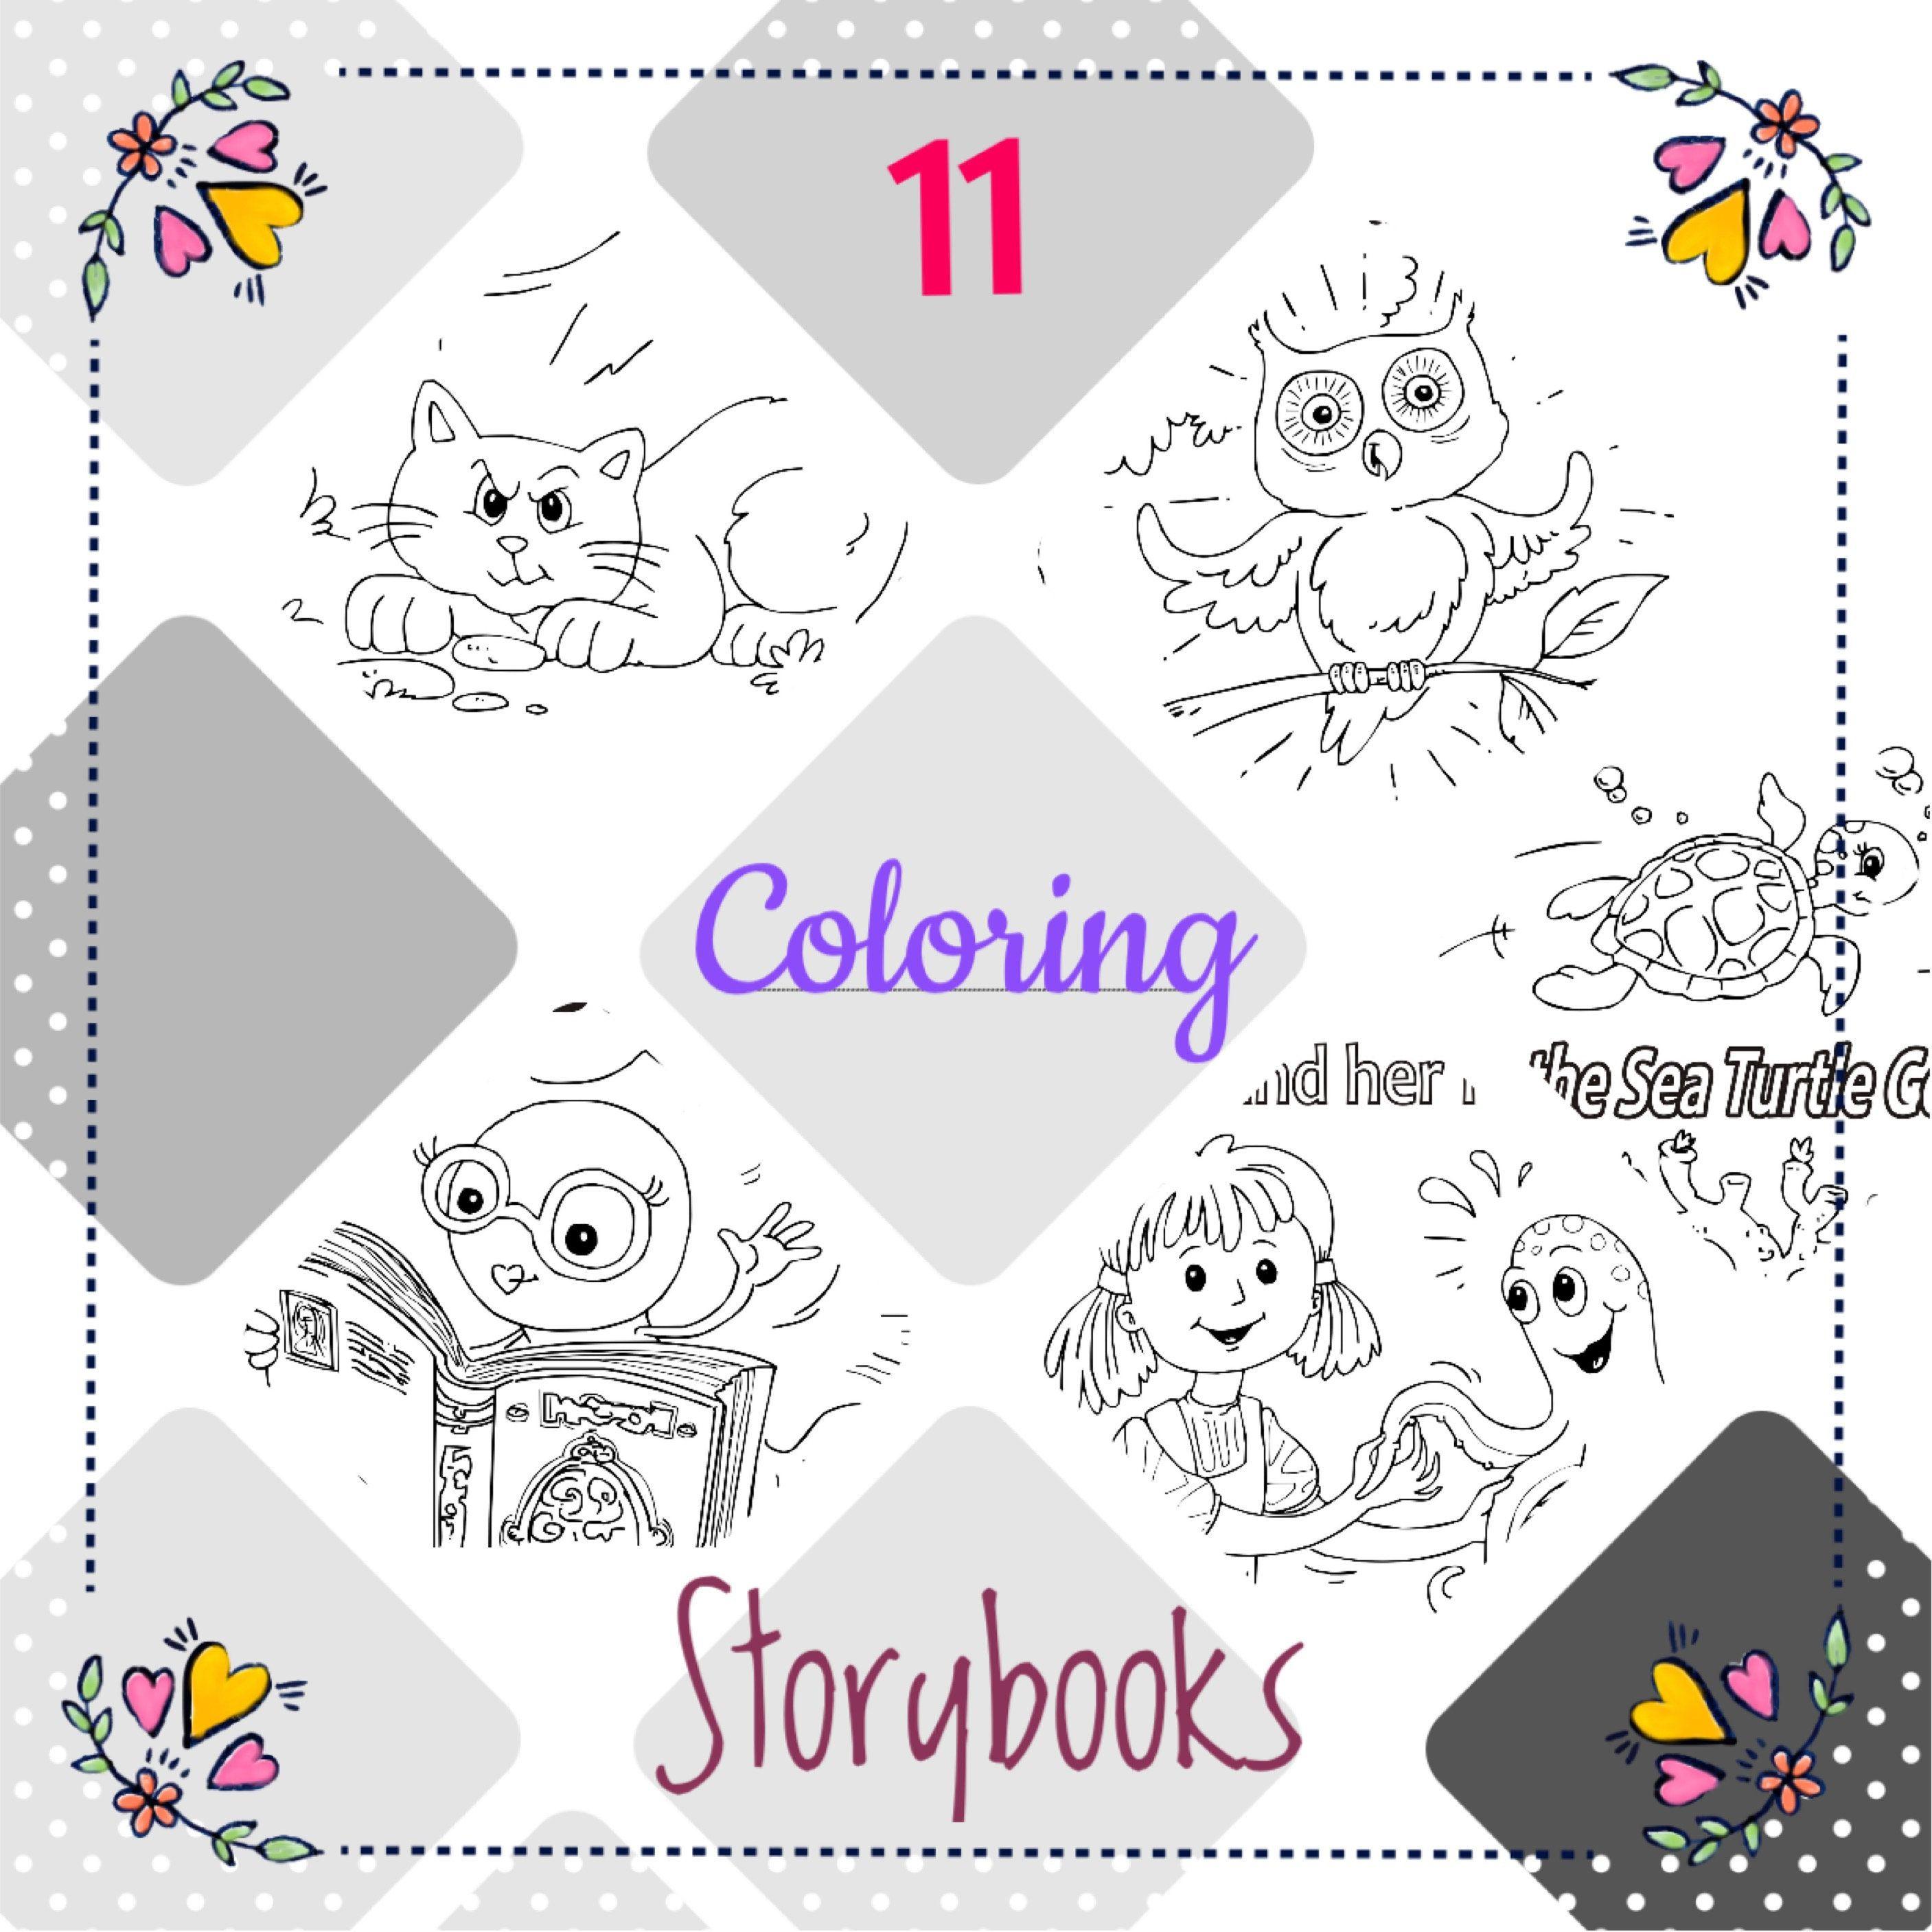 Printable Short Stories For Kids Printable Coloring Pages For Kids Little Ki Kids Printable Coloring Pages Printable Coloring Pages Coloring Pages For Kids